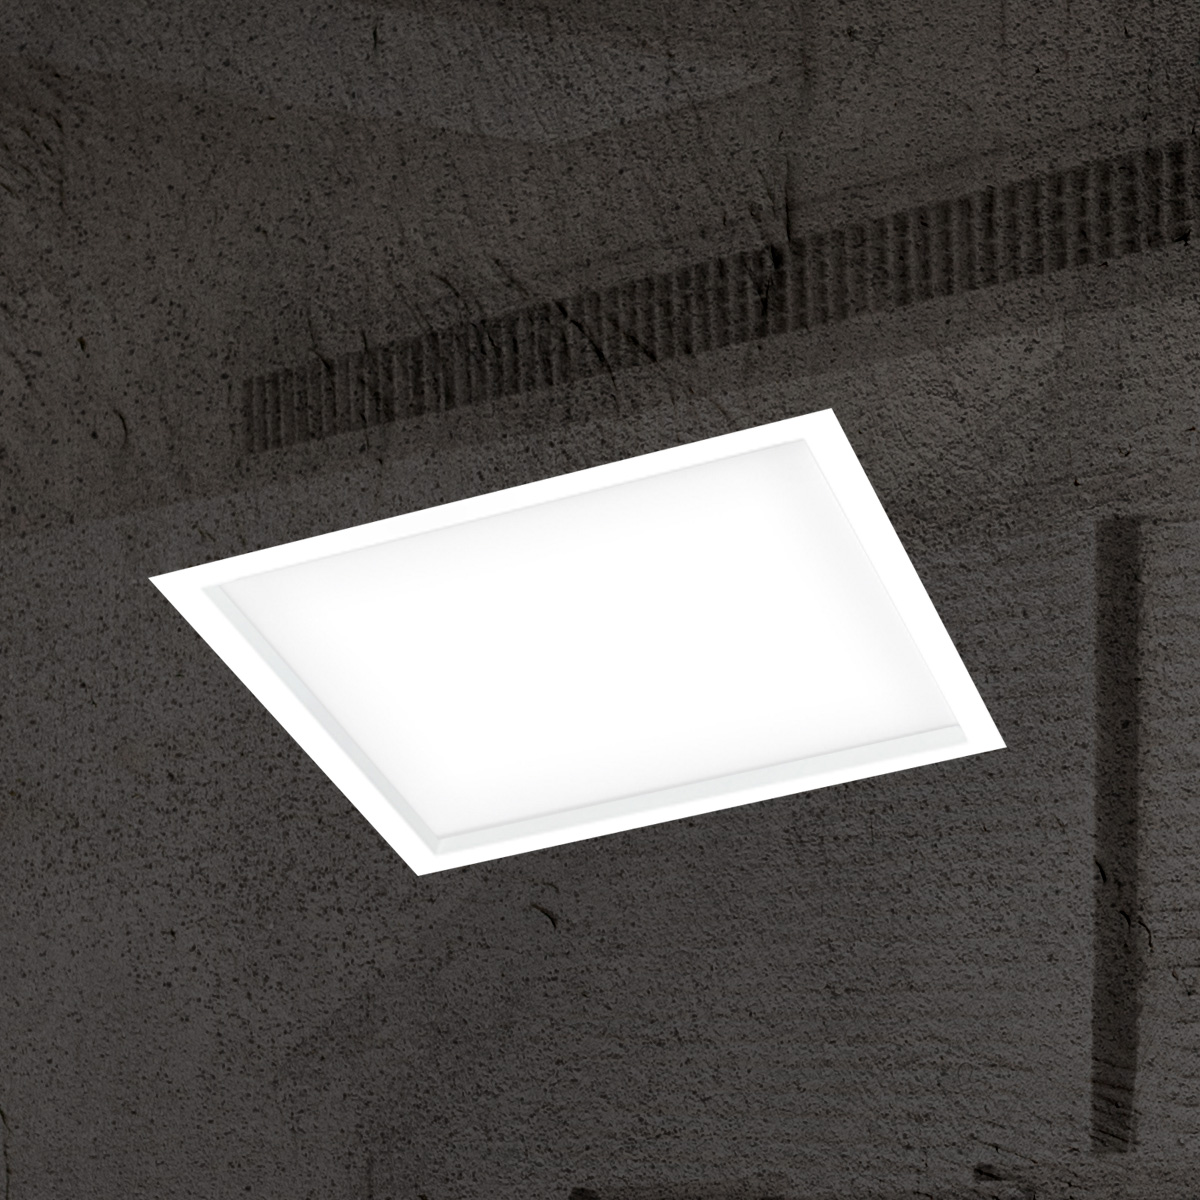 luminaria_embutir_square_II_img01